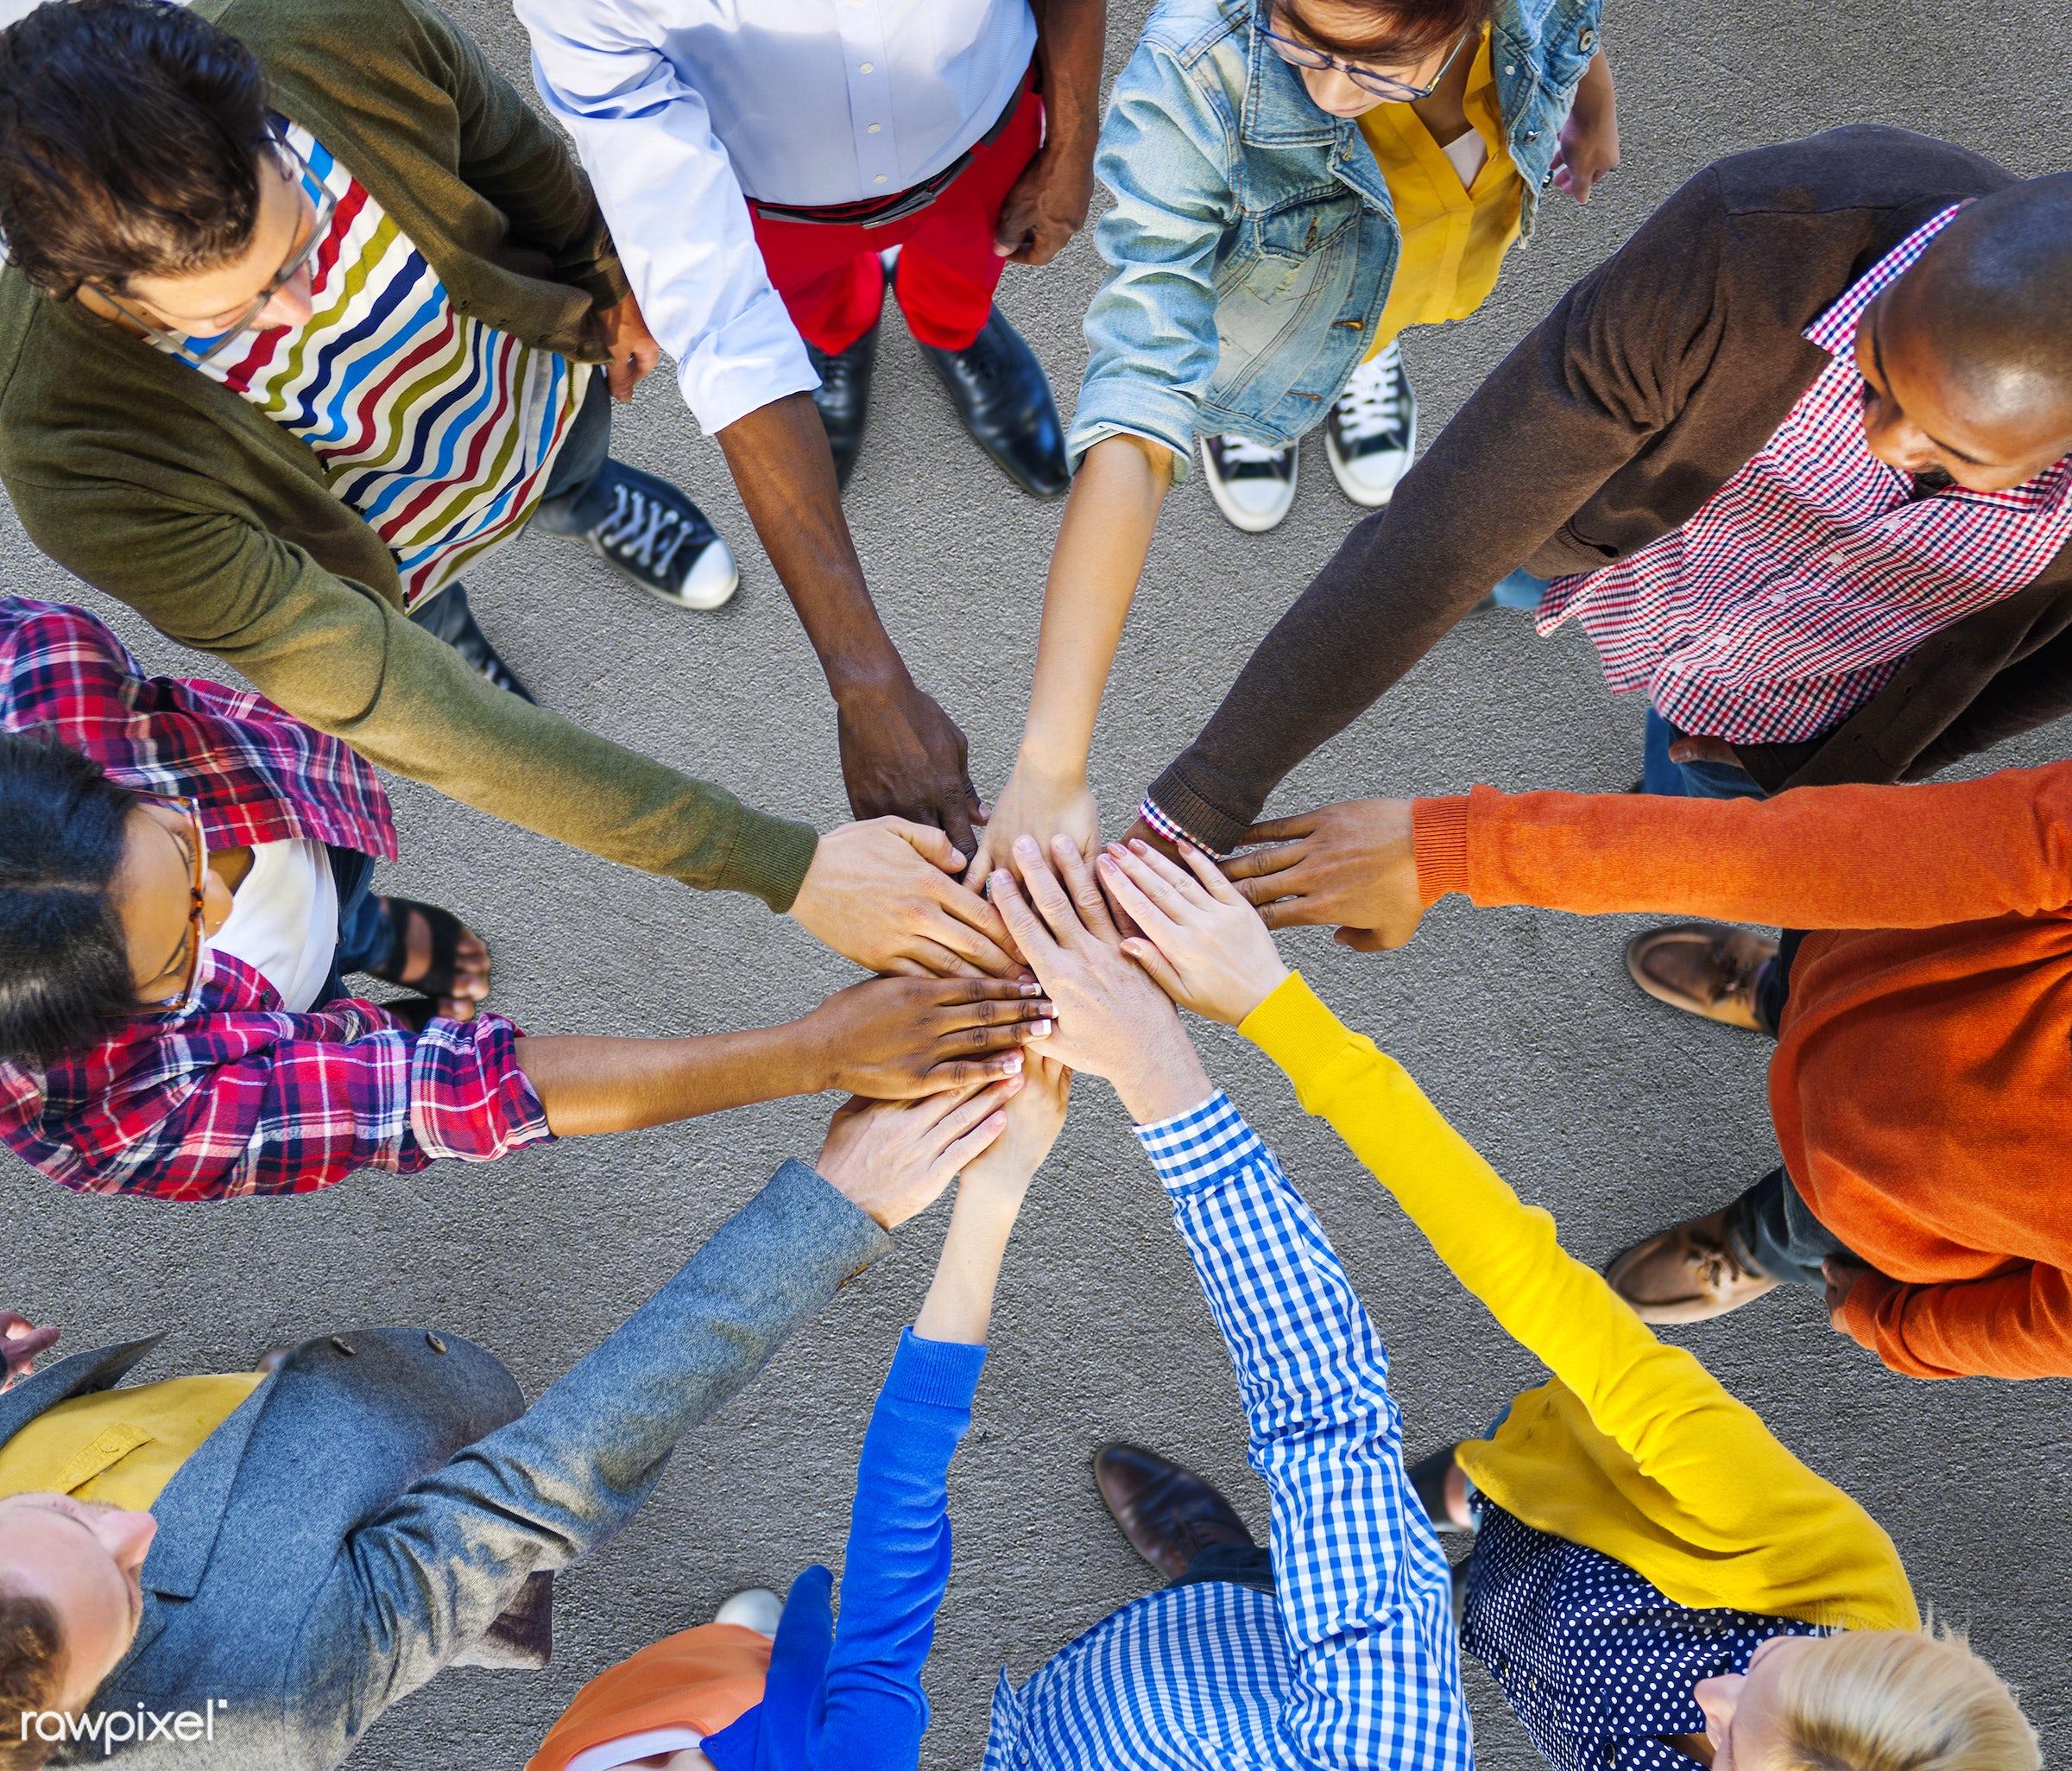 african descent, asian ethnicity, assistance, casual, circle, collaboration, colourful, communication, community, concrete...